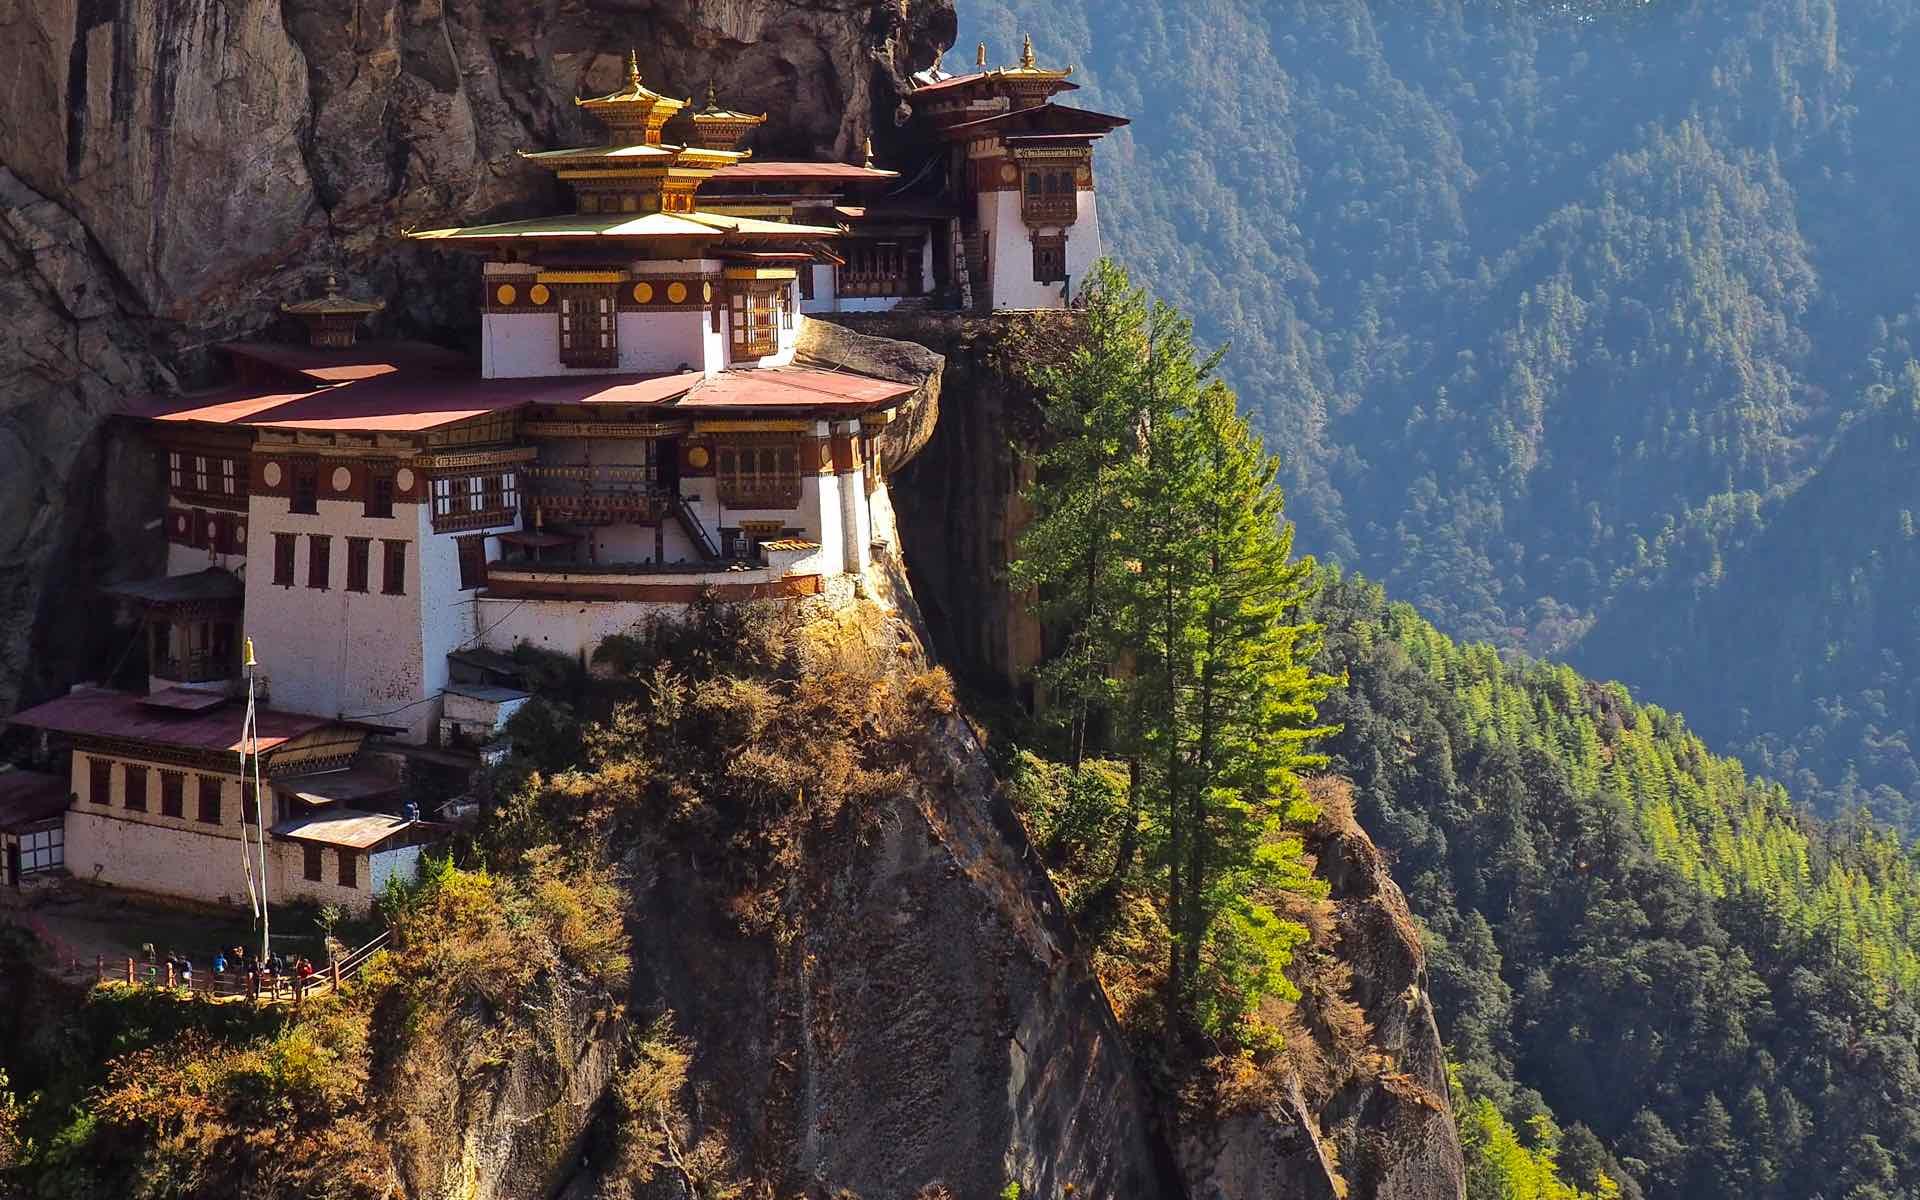 Tailor-made holidays to Asia. Tiger's Nest Monastery, Bhutan.